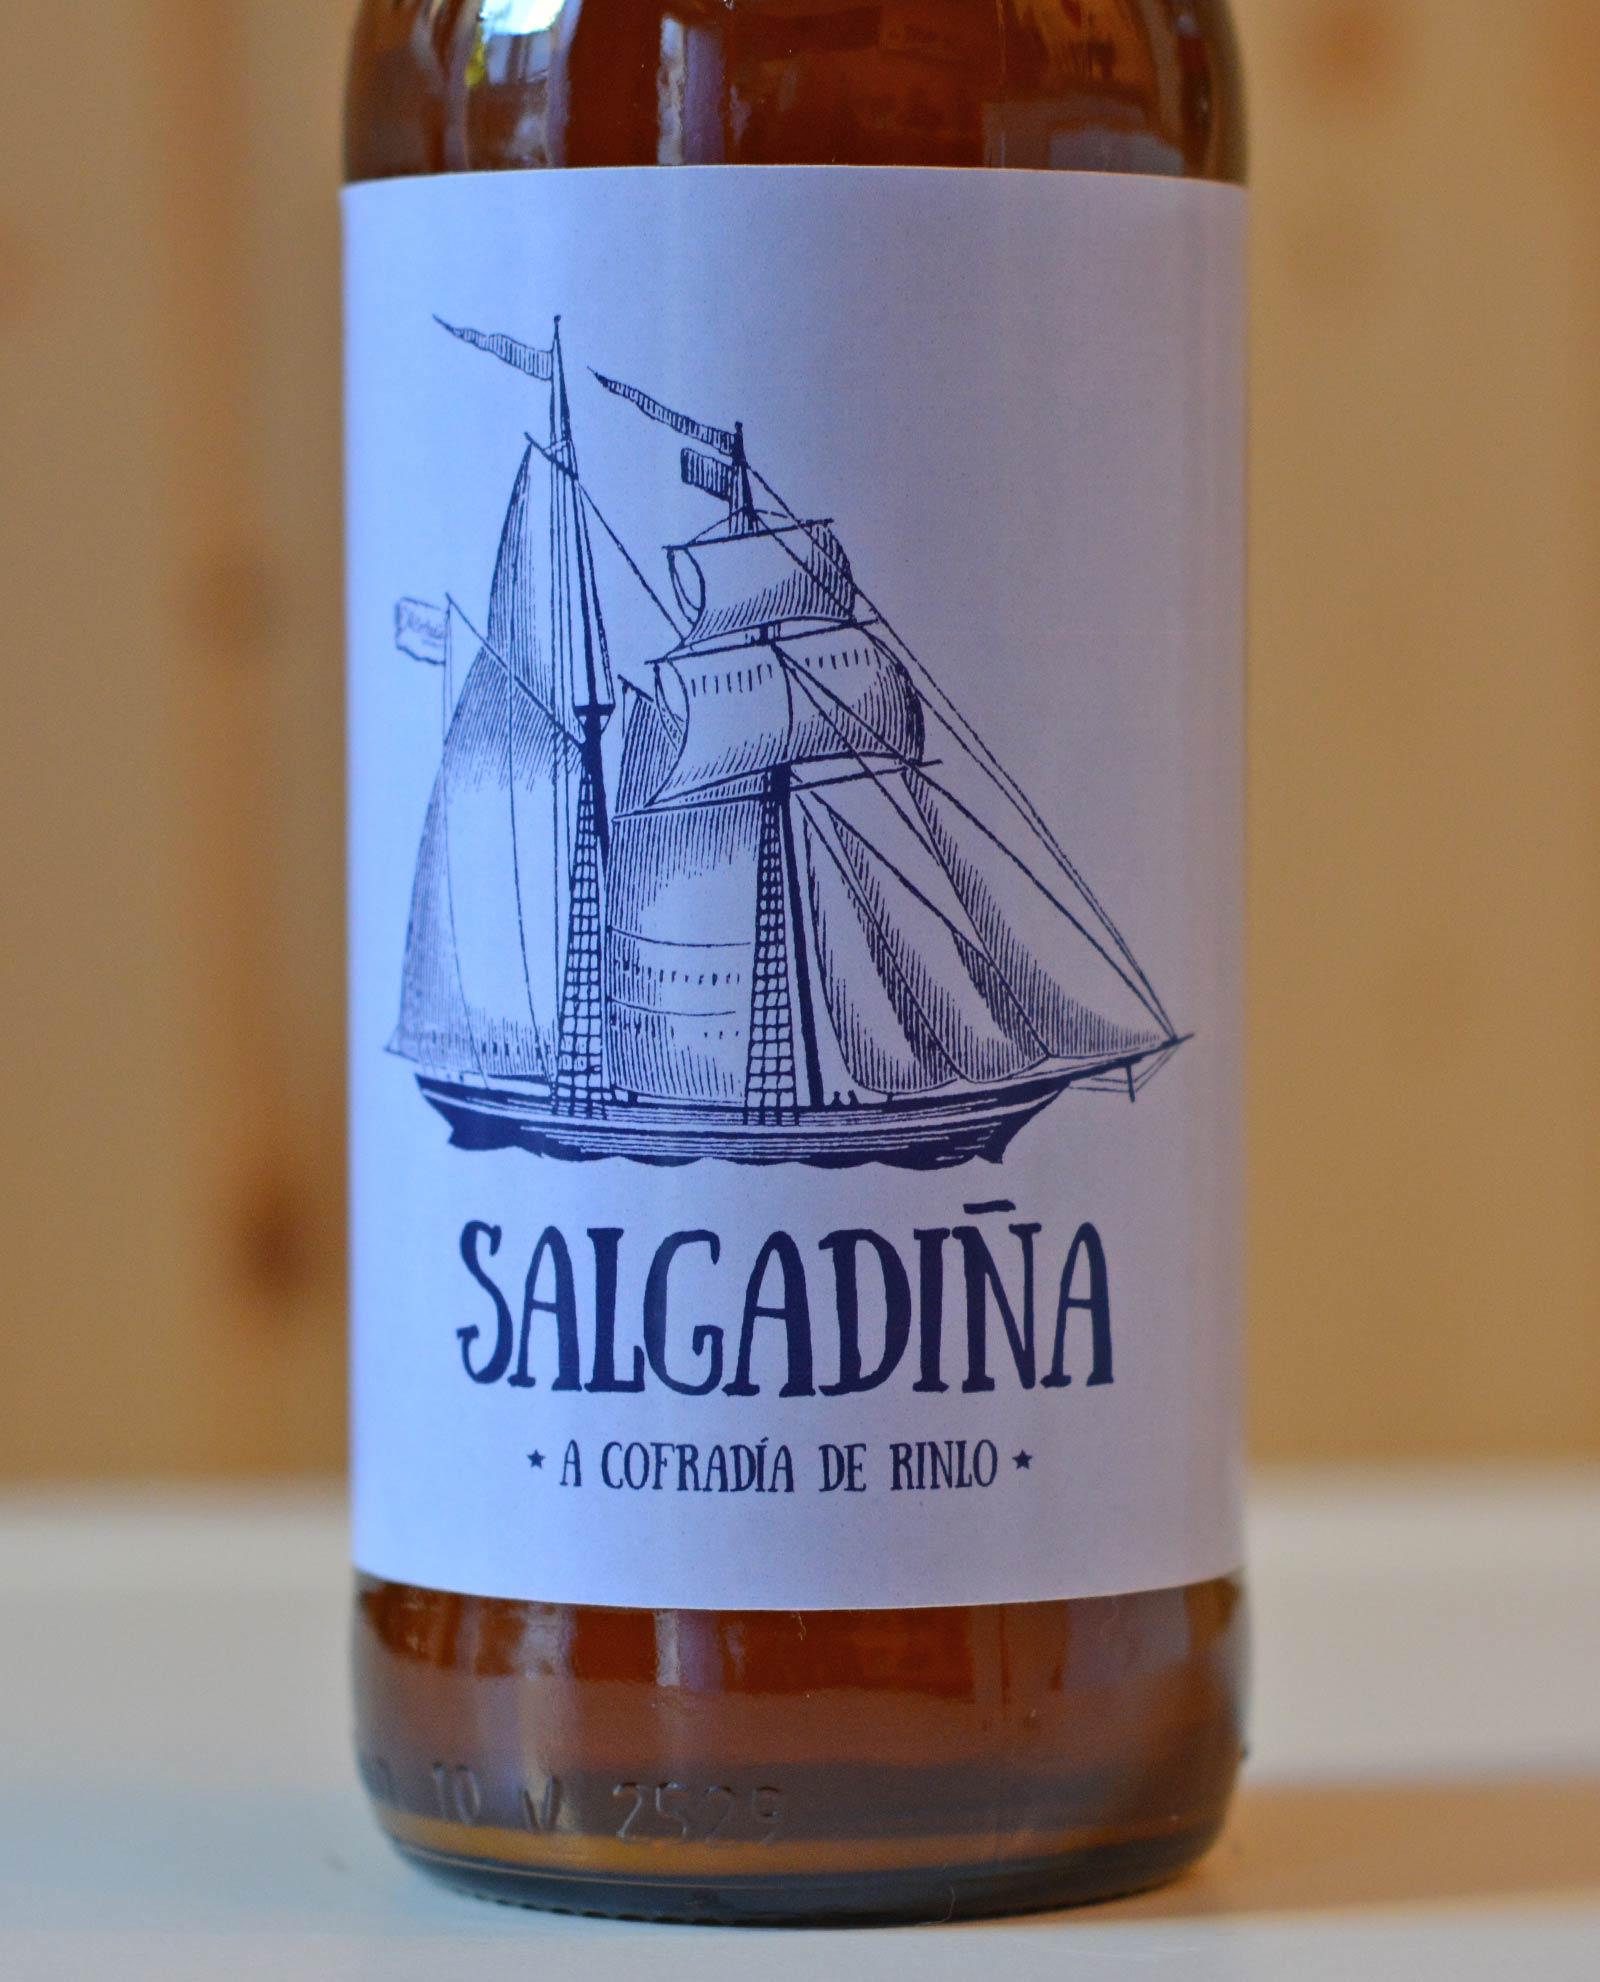 aloumina-cerveza-artesana-craft-beer-lugo-galicia-salgadina-cofradiaderinlo-gose-001a